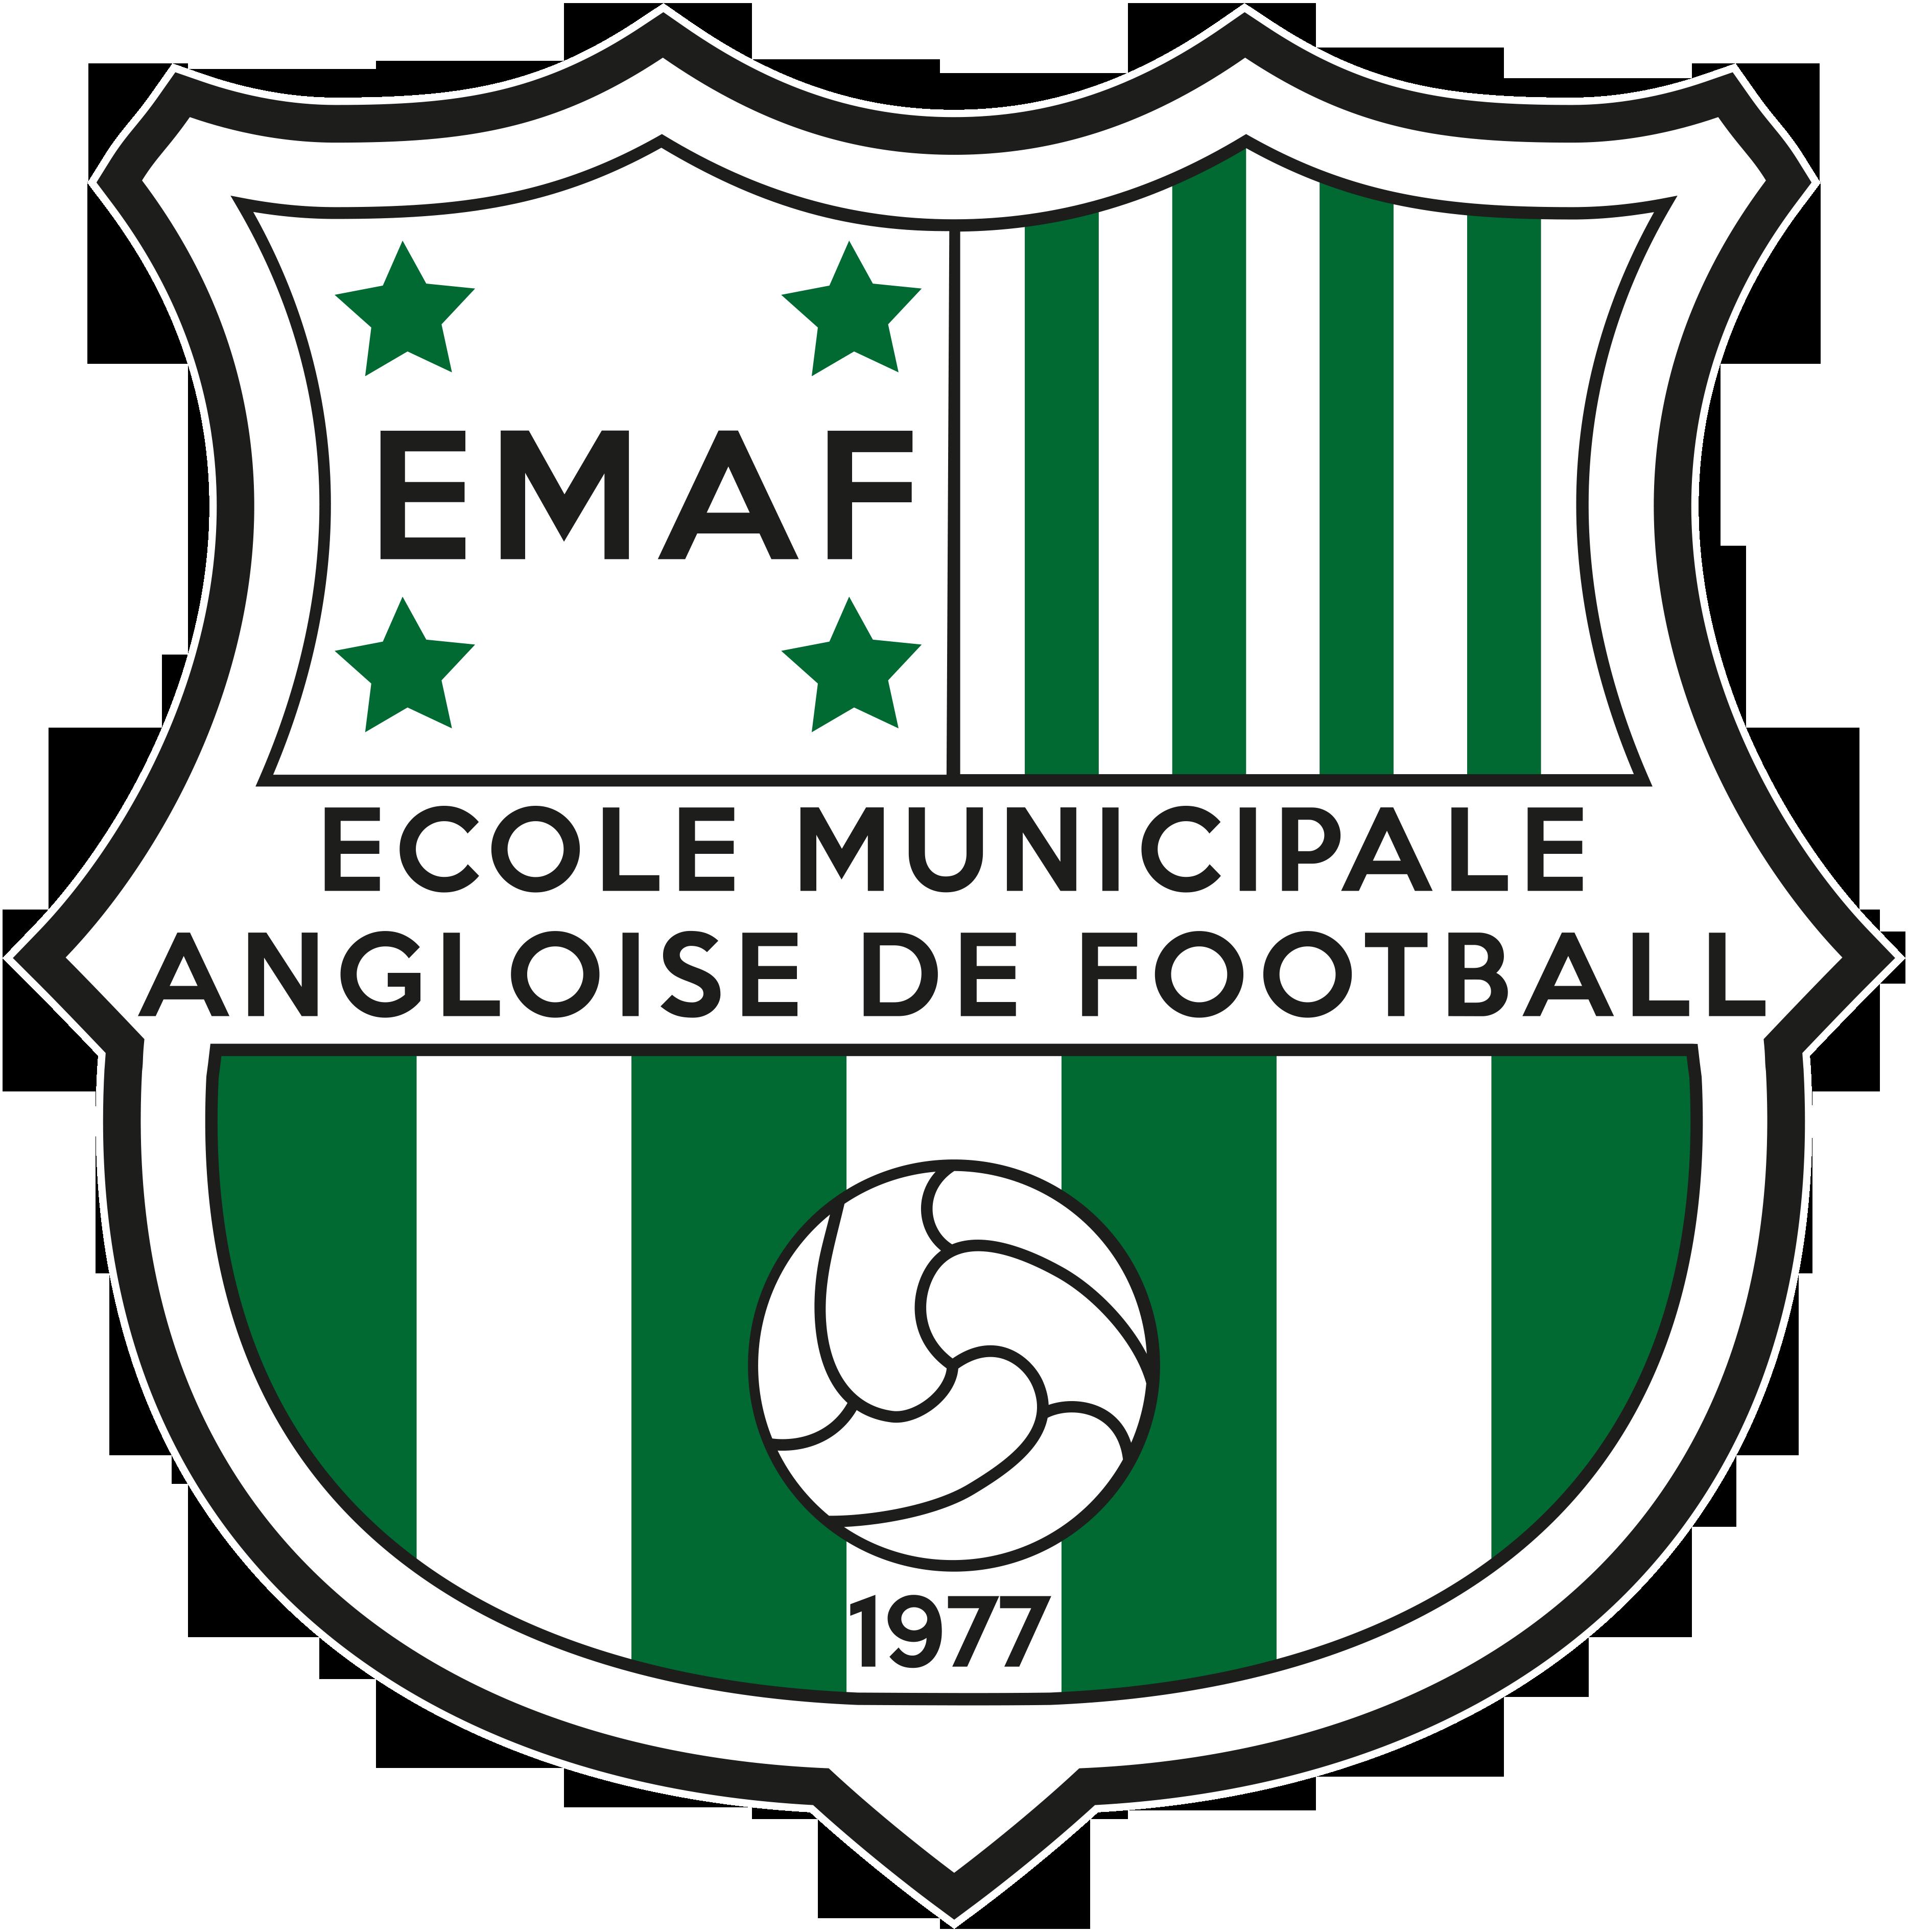 logo EMAF